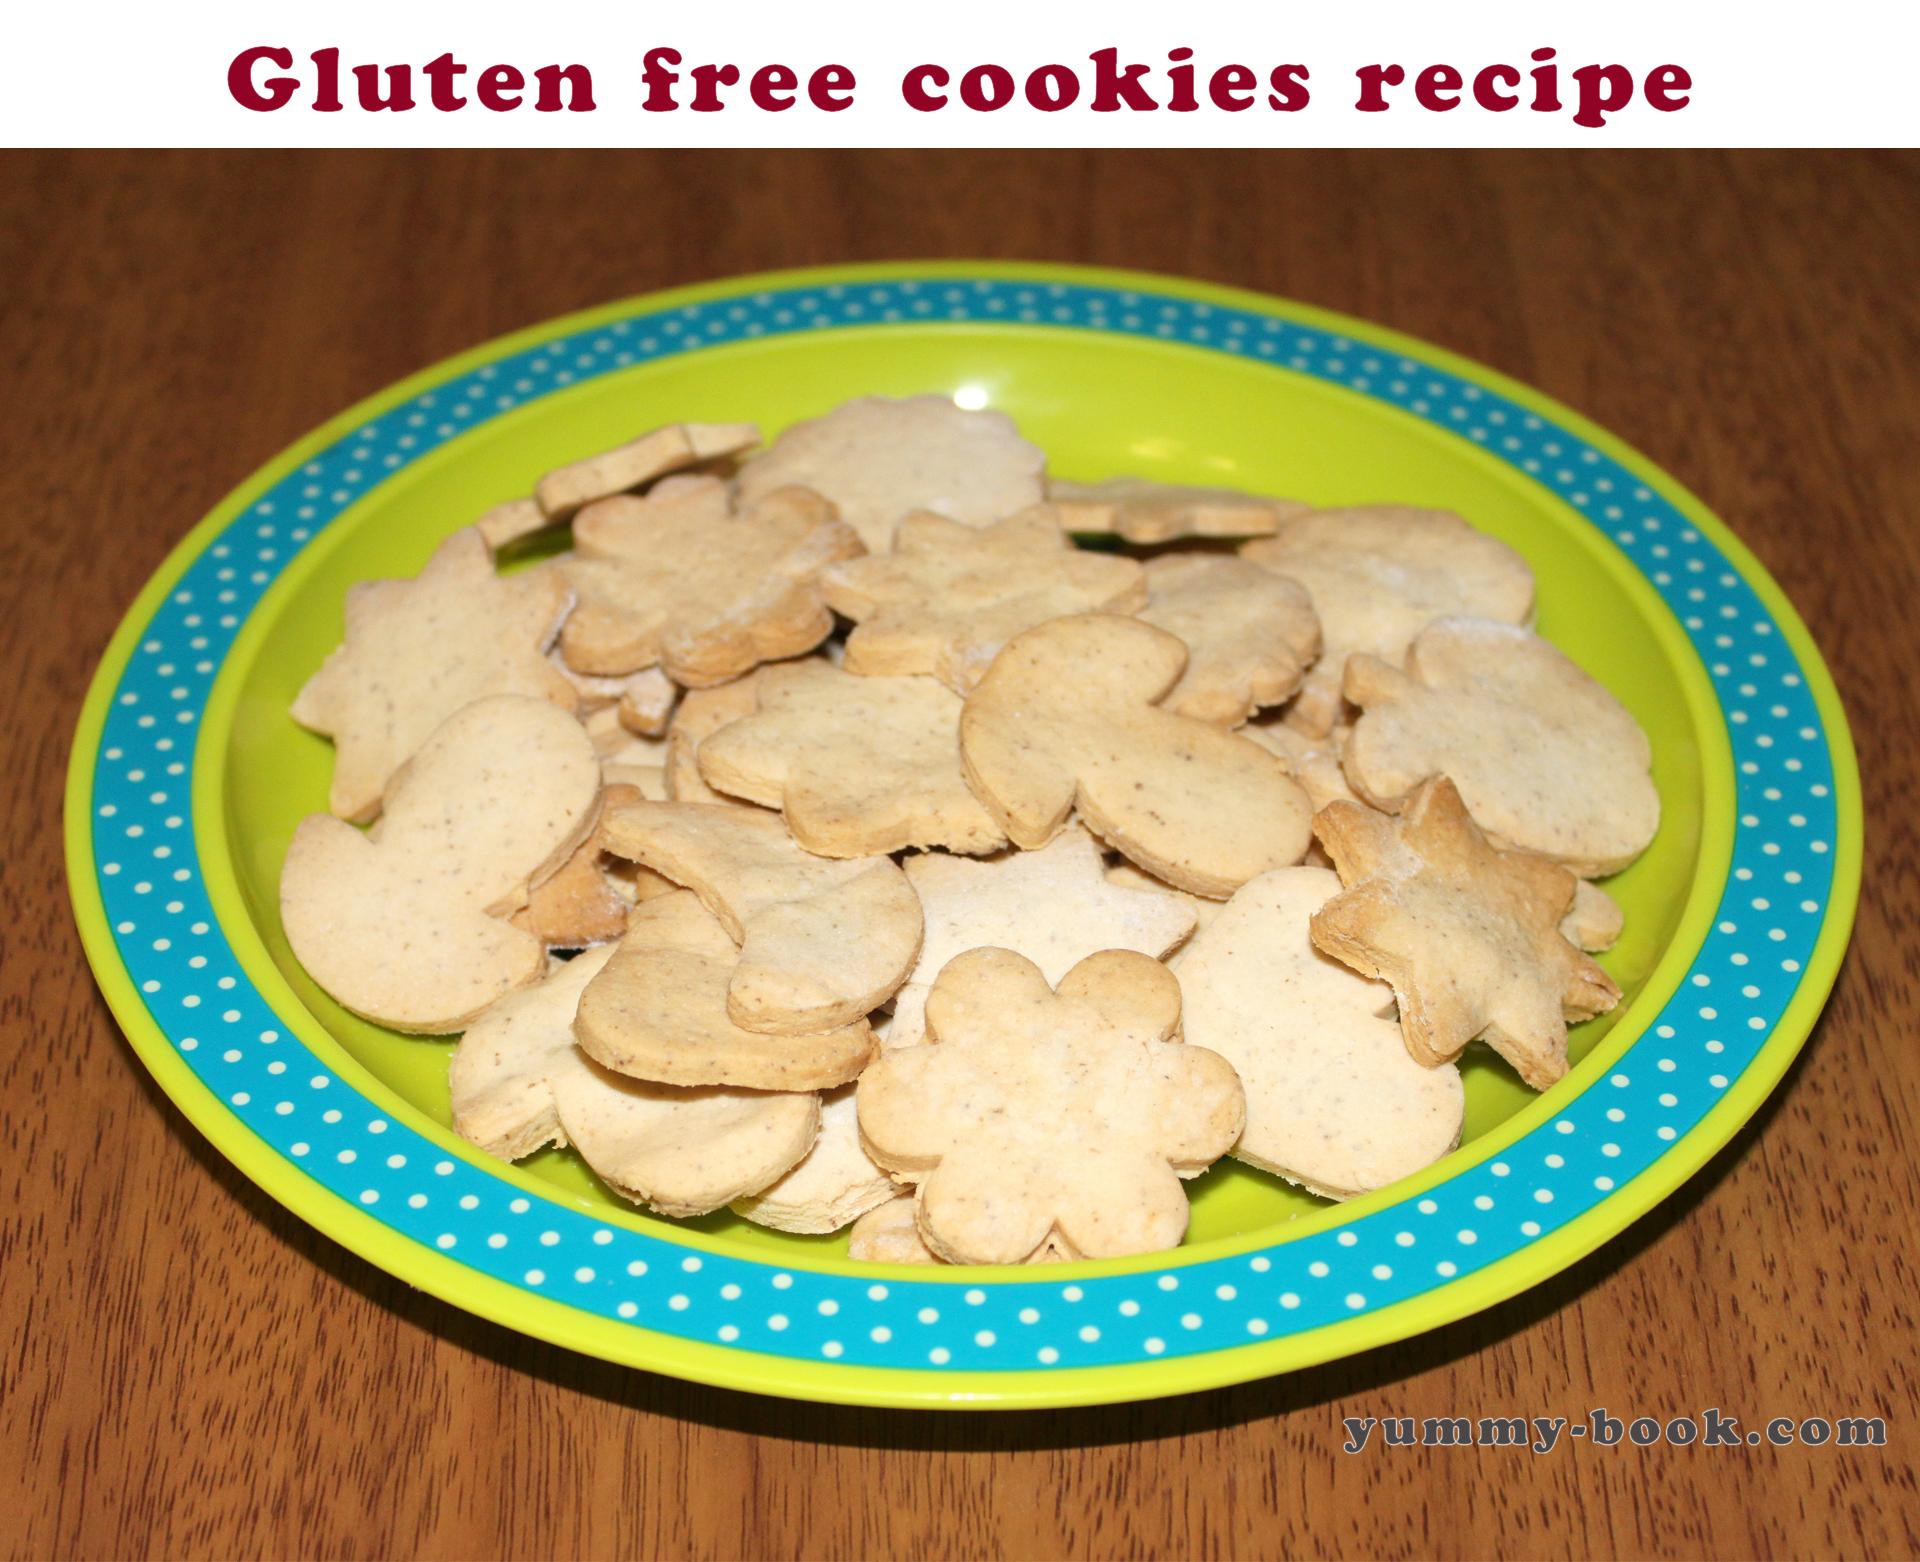 Gluten free cookies recipe - Yummy-book